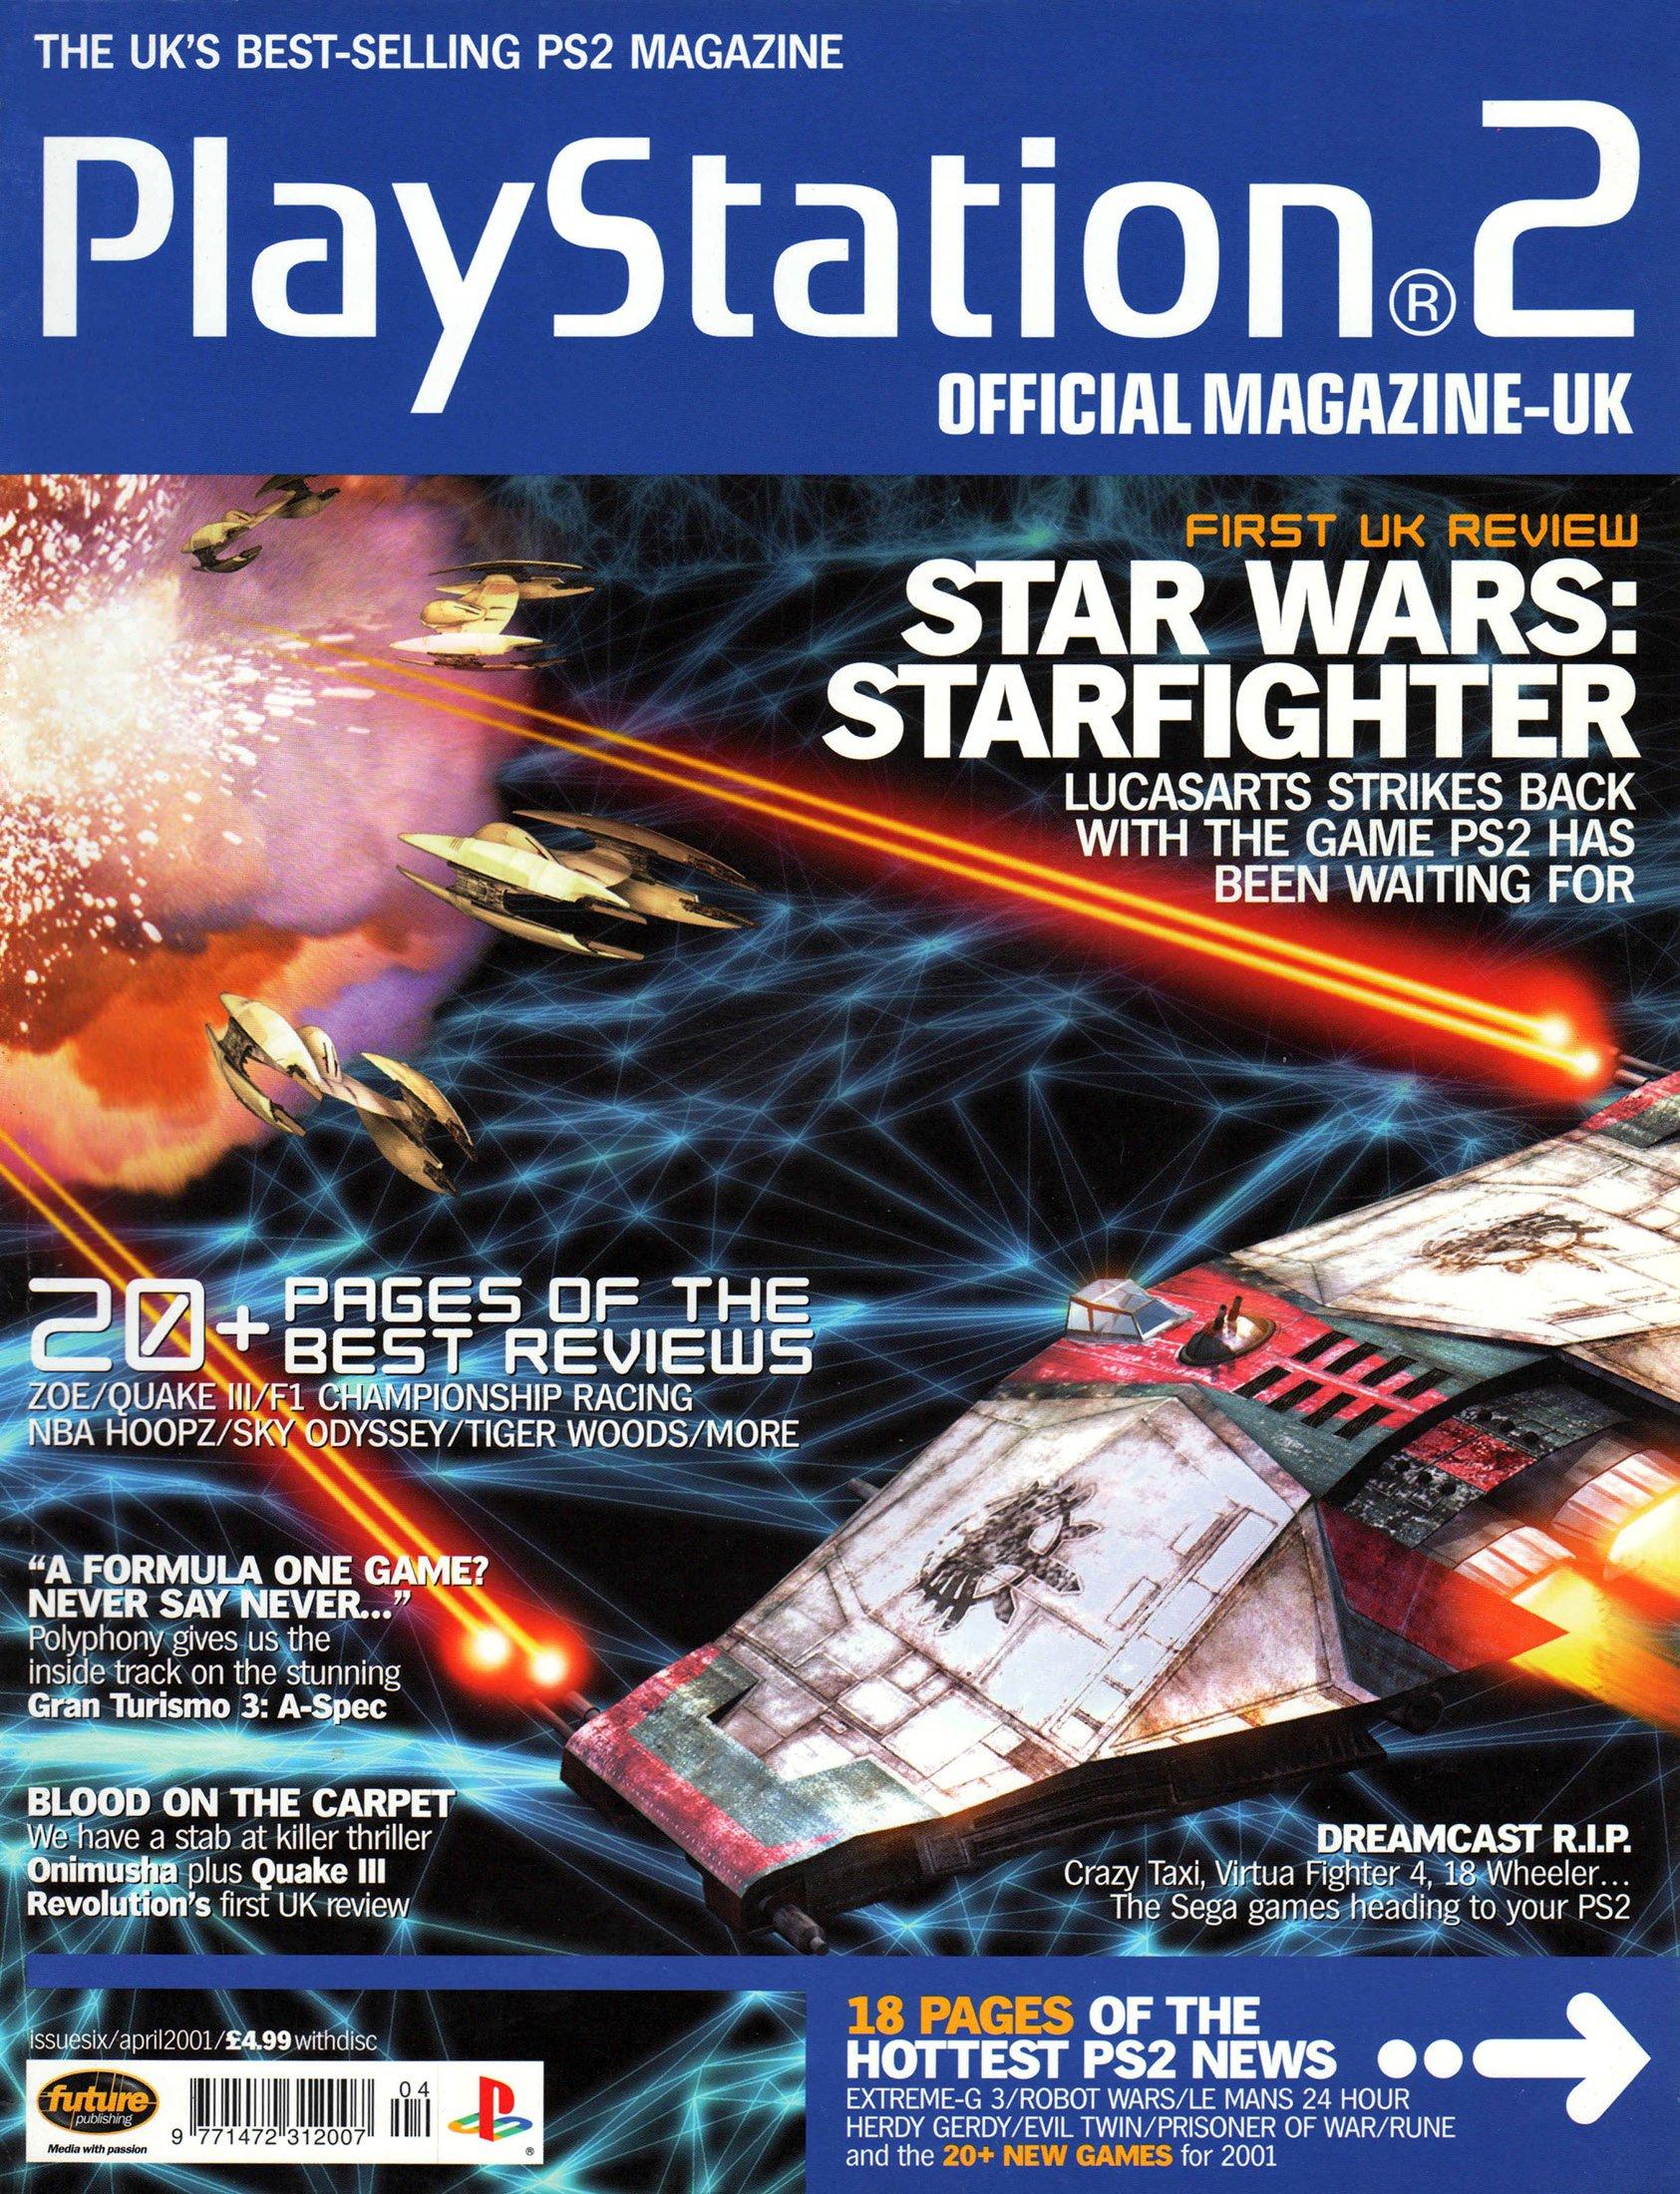 Official Playstation 2 Magazine UK 006 (April 2001)